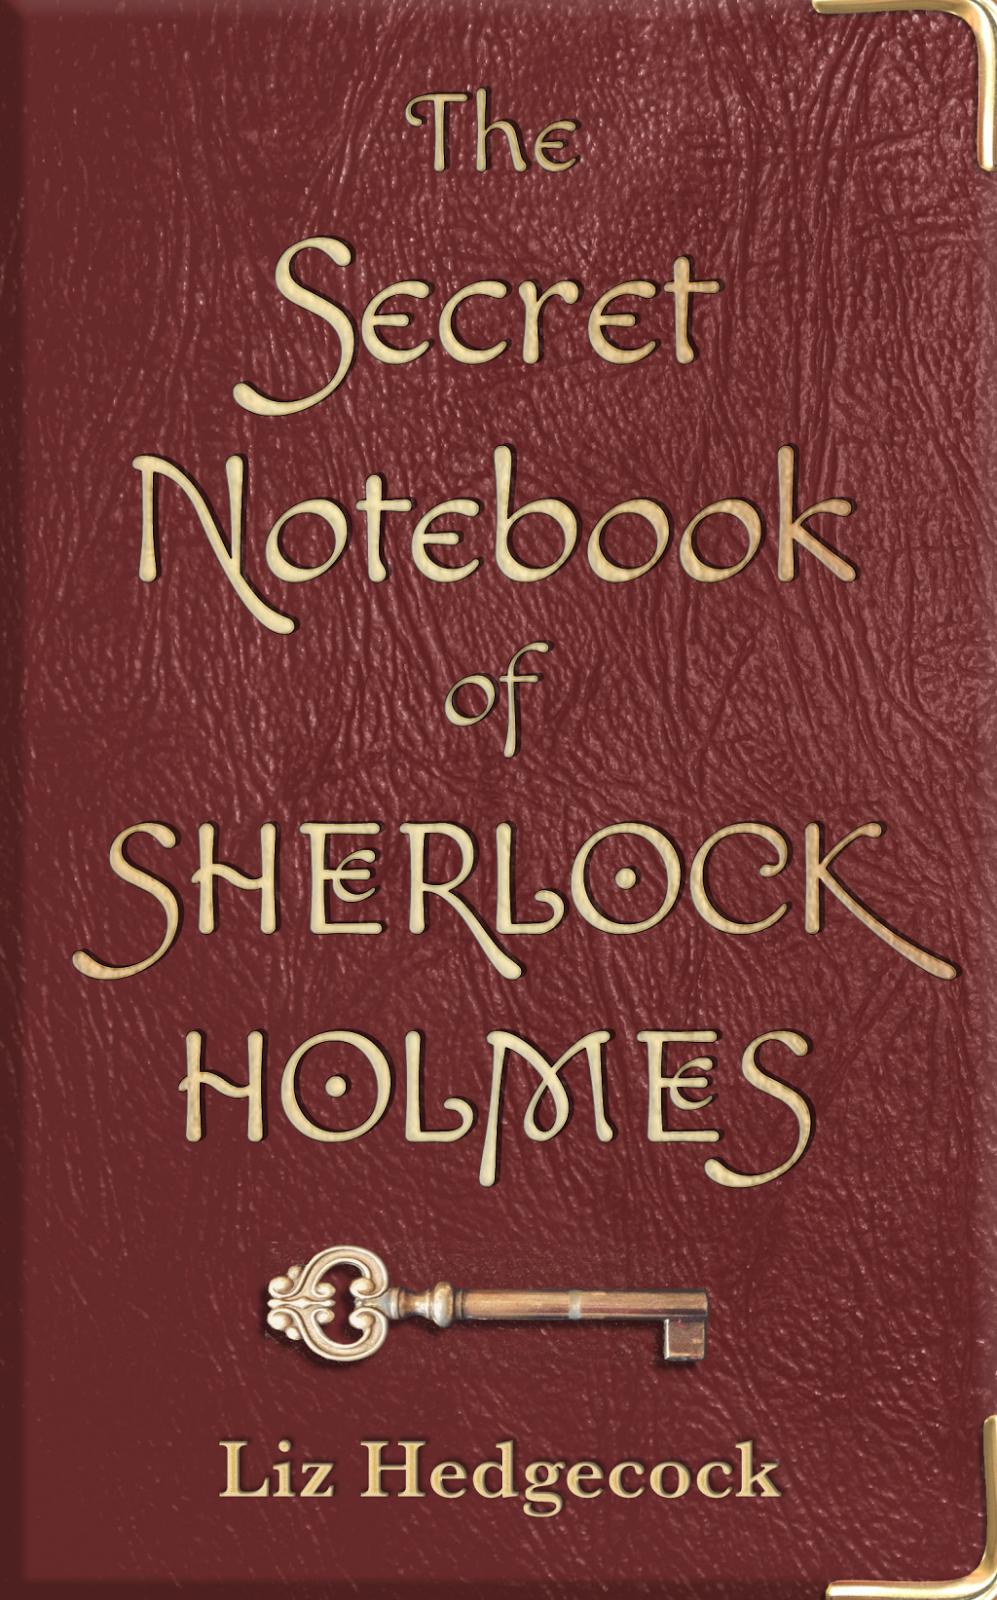 Solution Sherlock Holmes Escape Room Camden